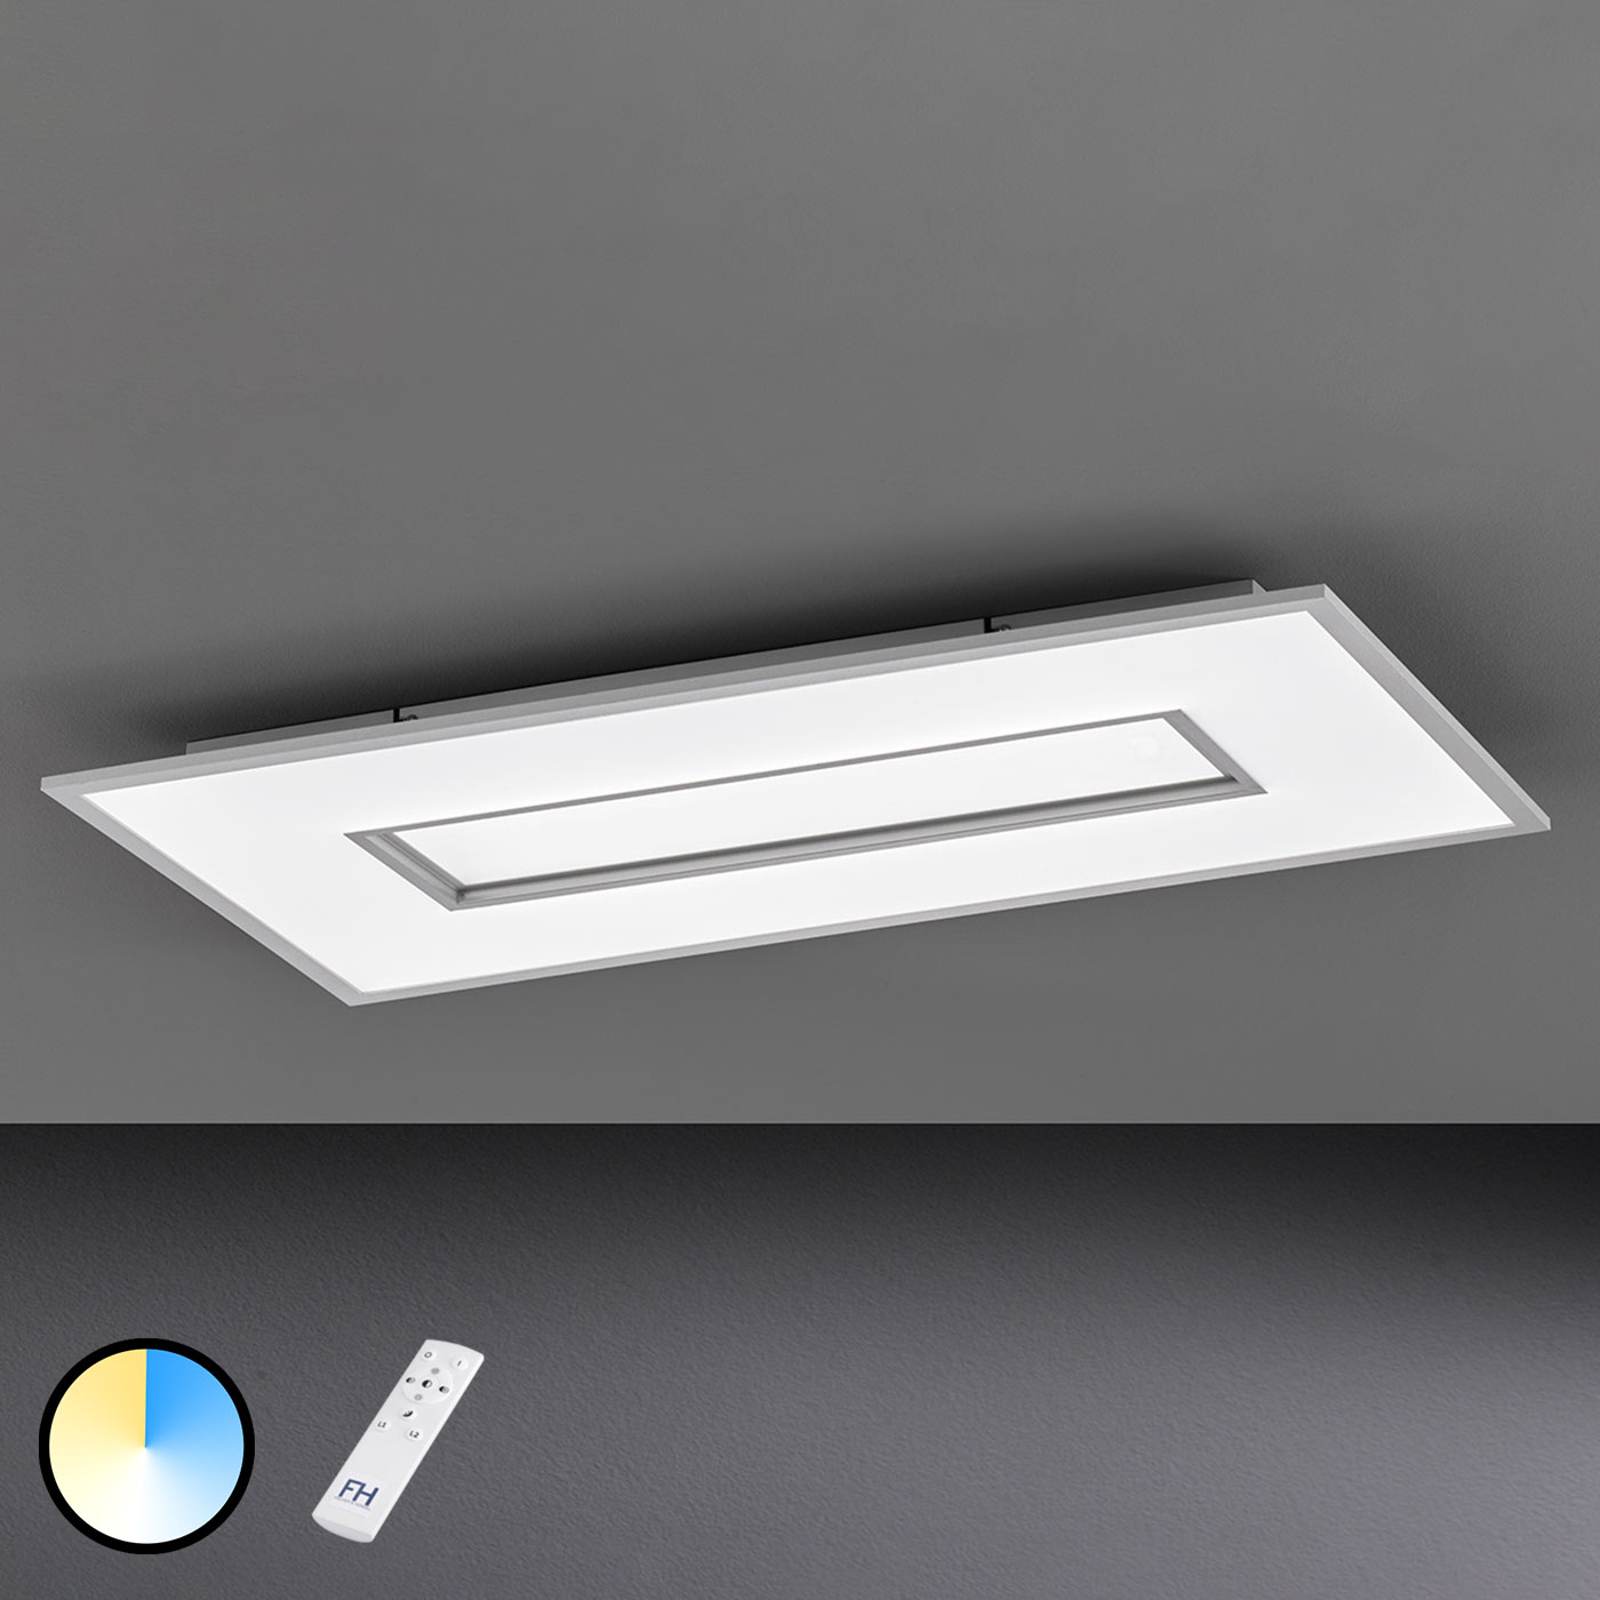 LED plafondlamp Tiara rechthoek 96x50 cm